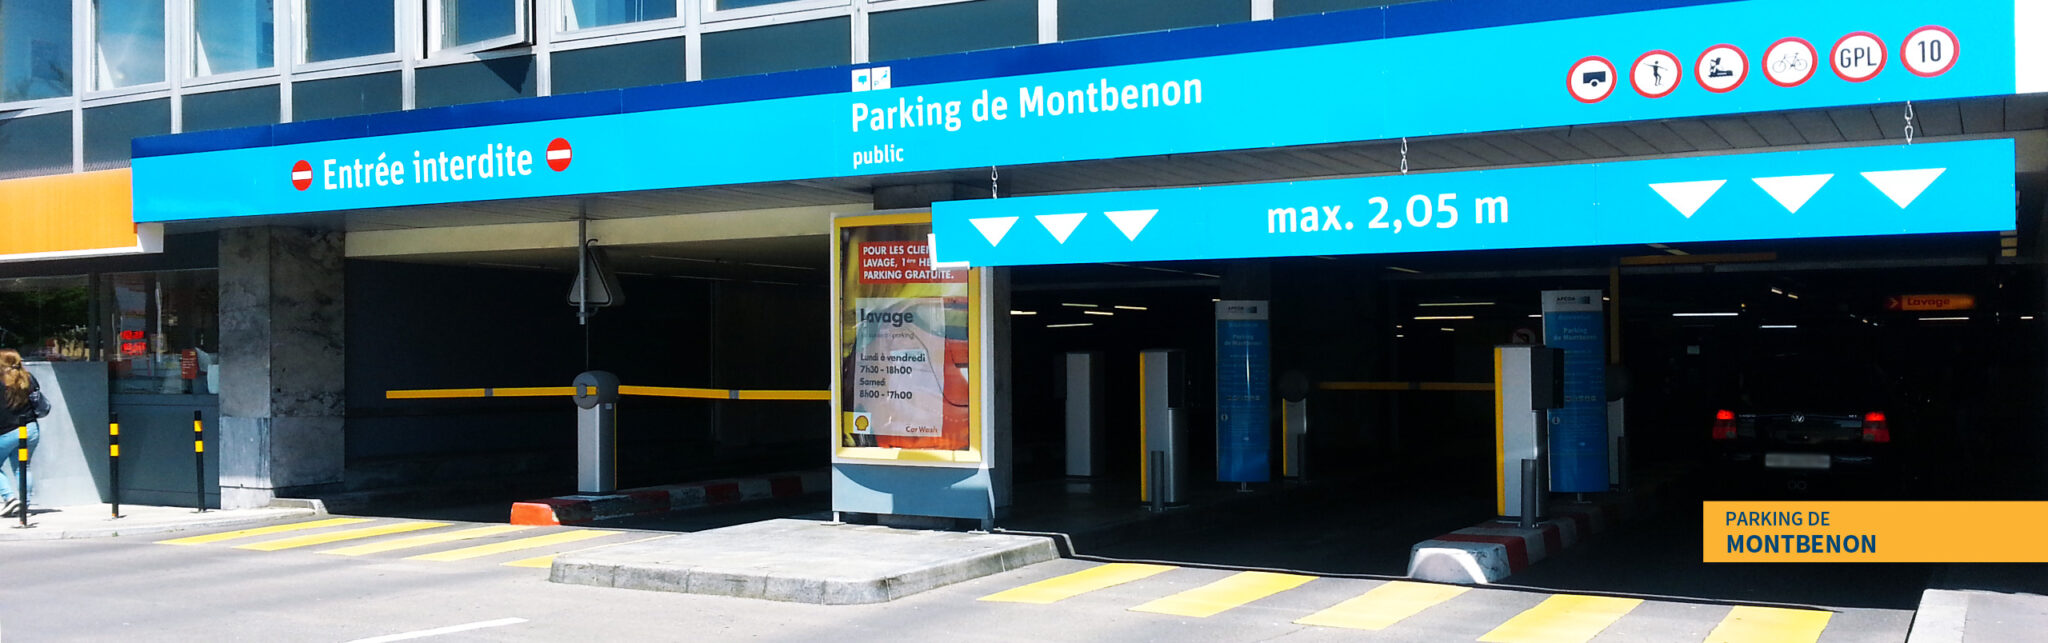 Parking Montbenon